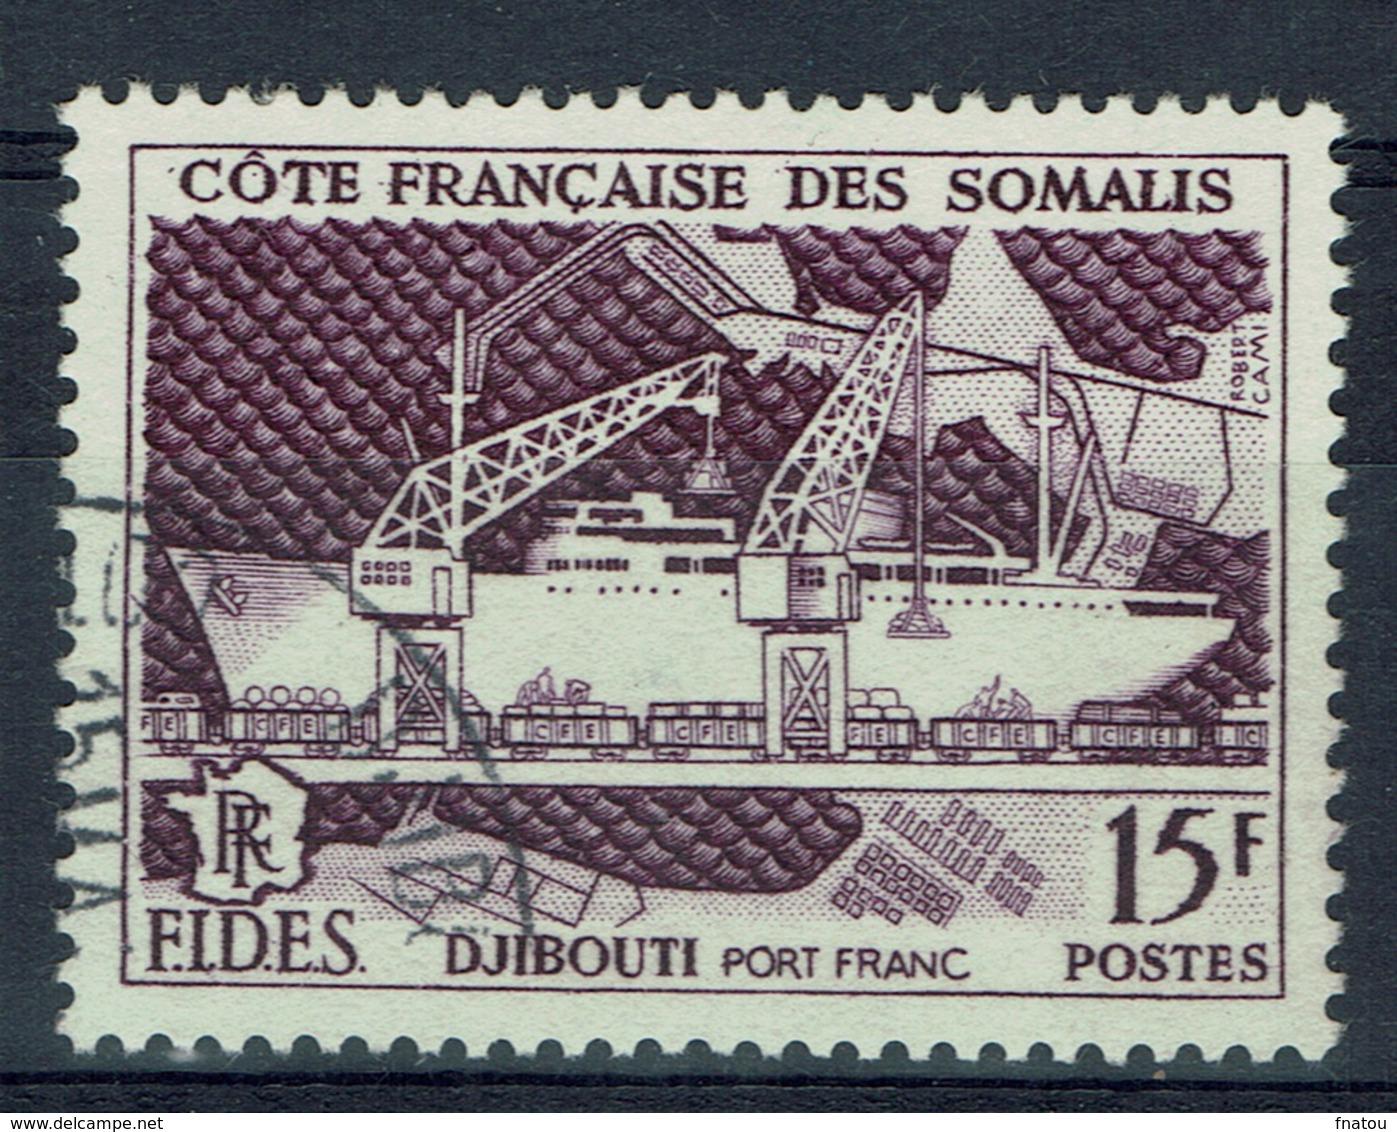 French Somali Coast, Port Of Djibouti, FIDES, 1956, VFU - French Somali Coast (1894-1967)